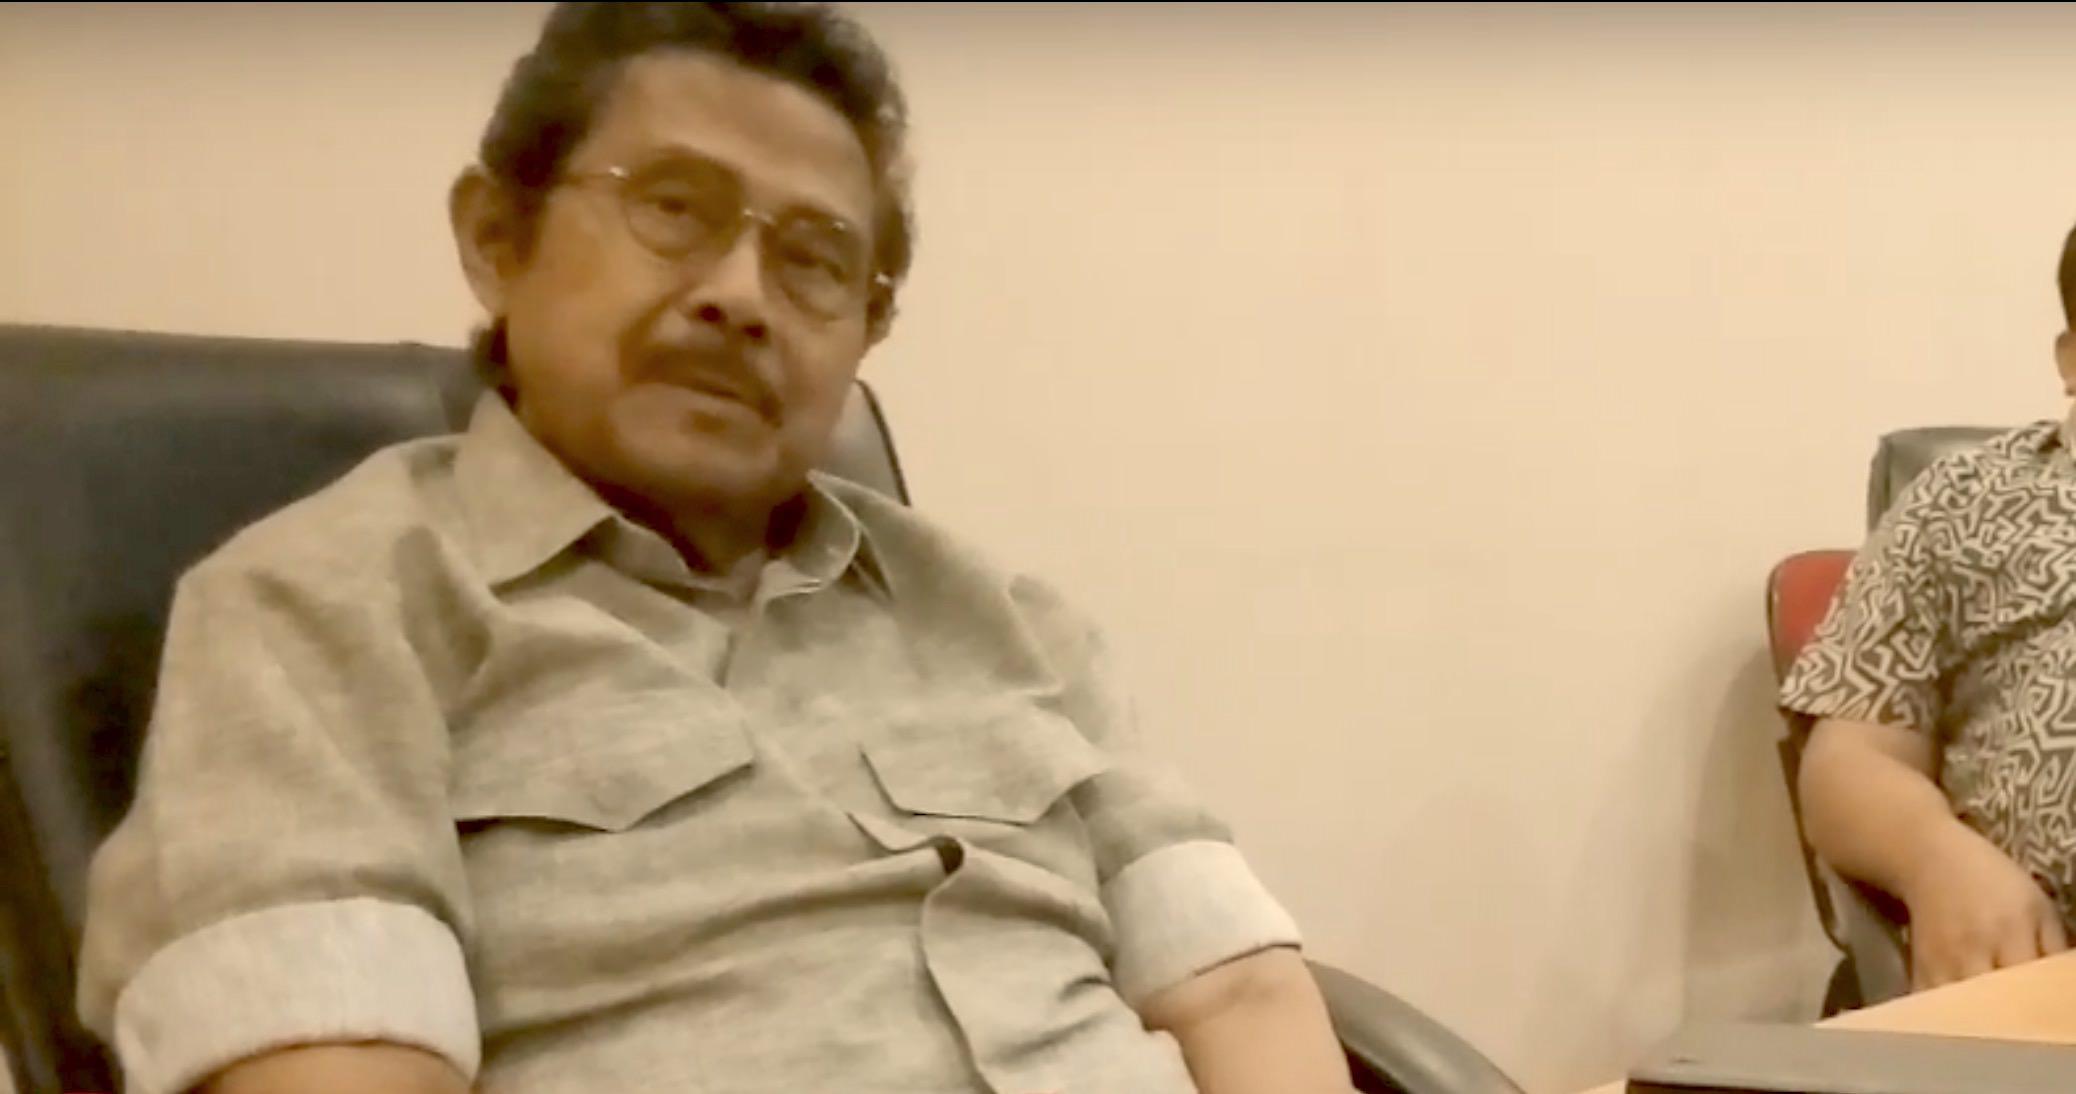 Dari Diskusi Fordis ICS Kahmi: Genjot Produksi Dalam Negeri Stop Impor Untuk Selamatkan Rakyat